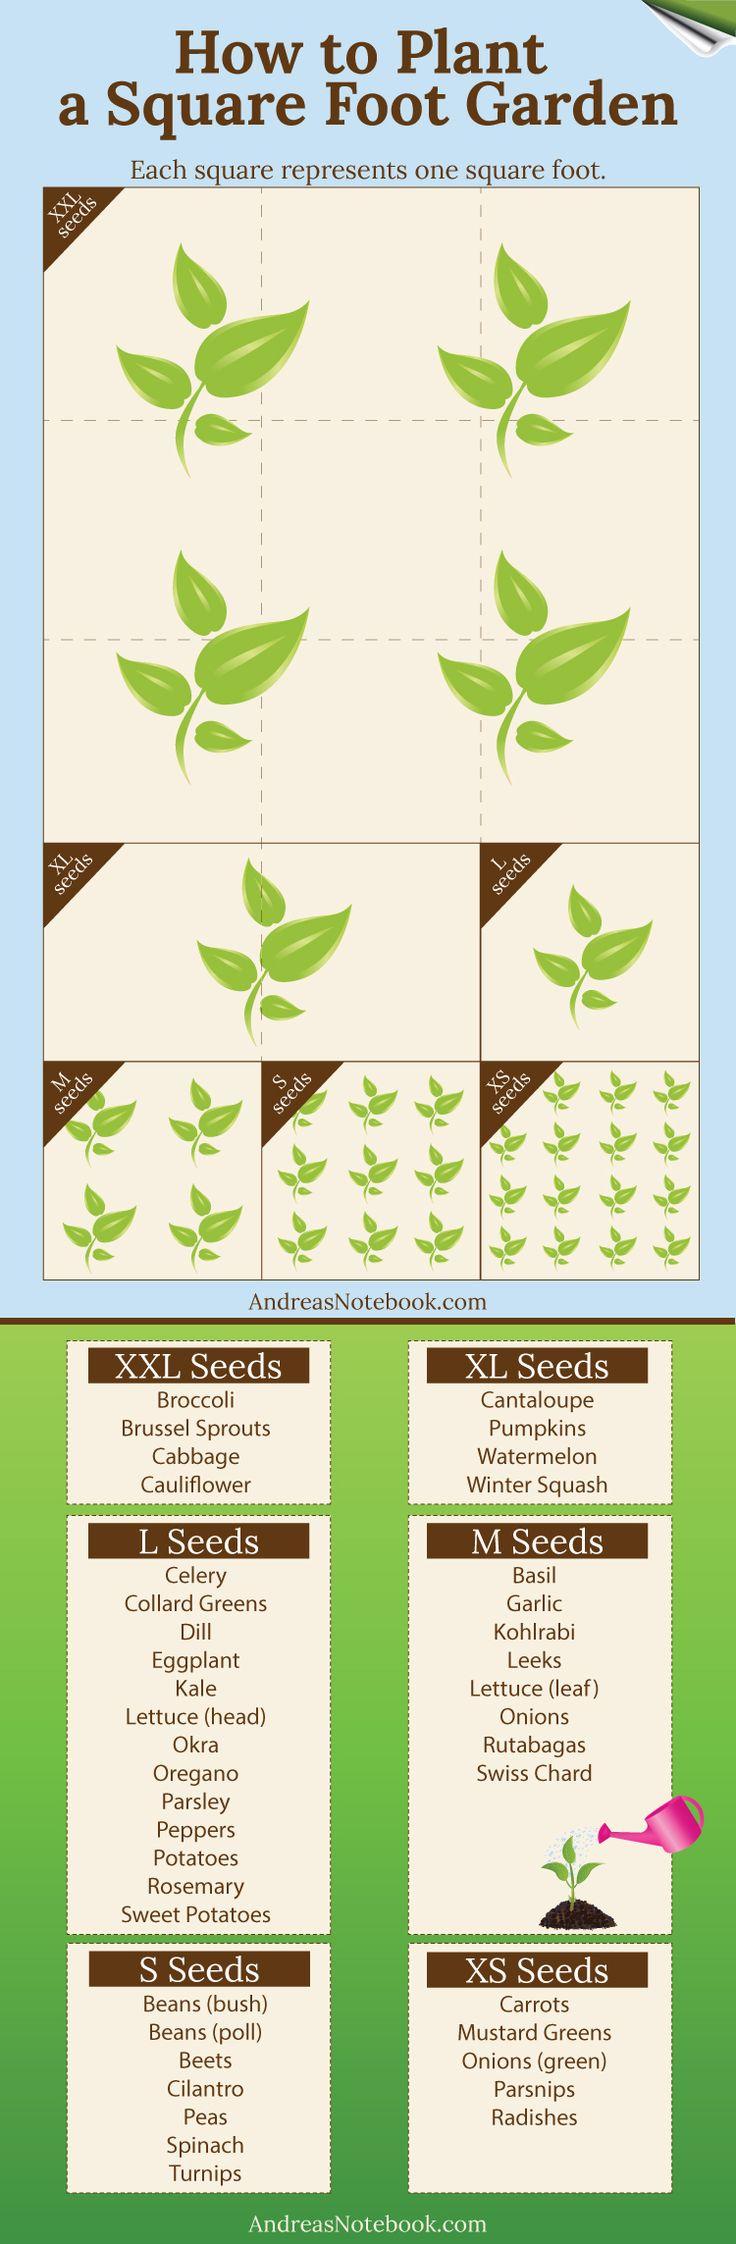 best vegetable and fruit garden images on pinterest vegetable